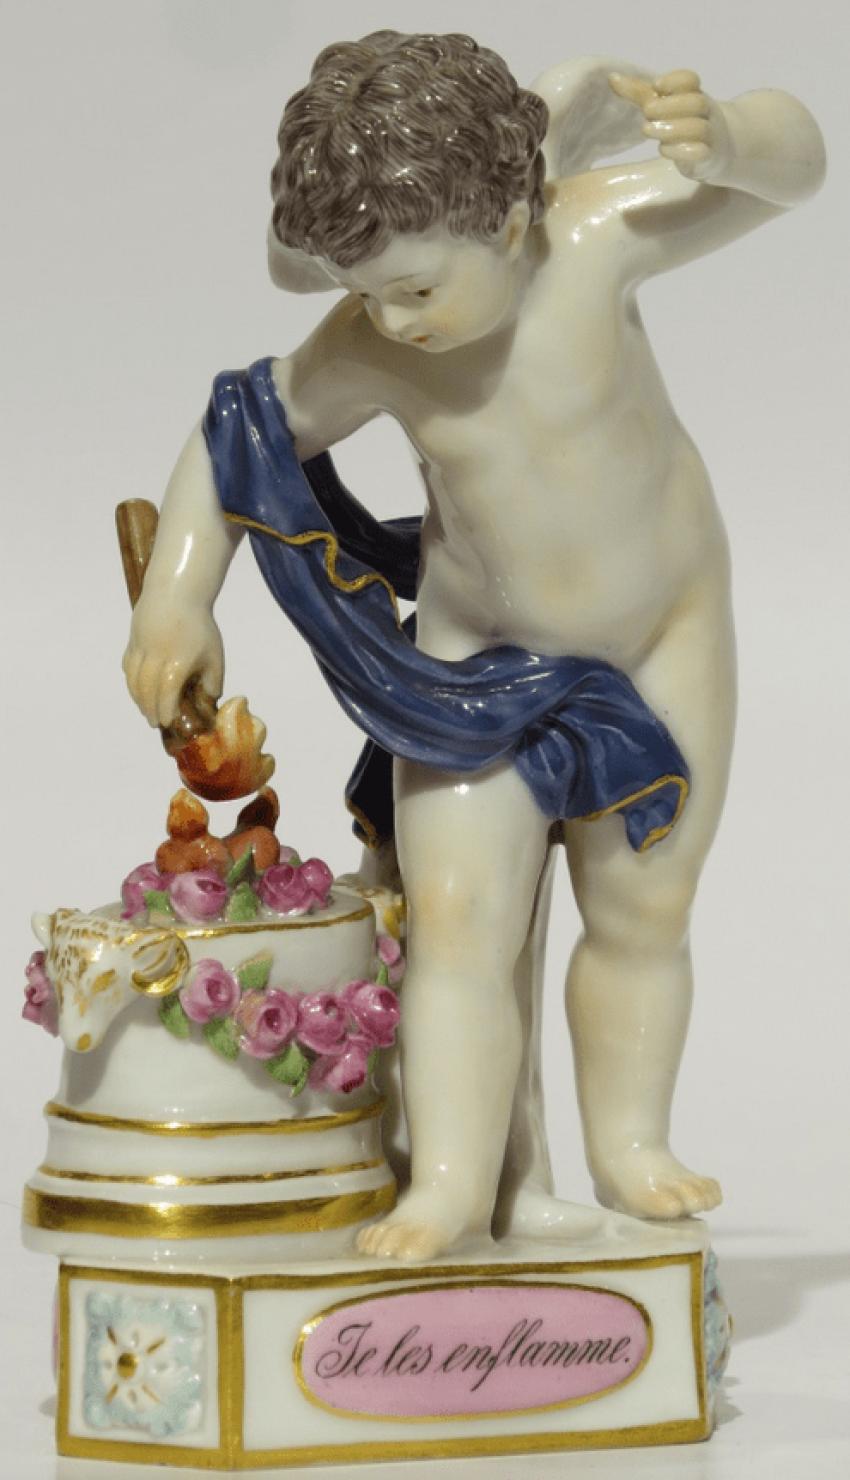 porcelain. 19th century Meissen. - photo 1